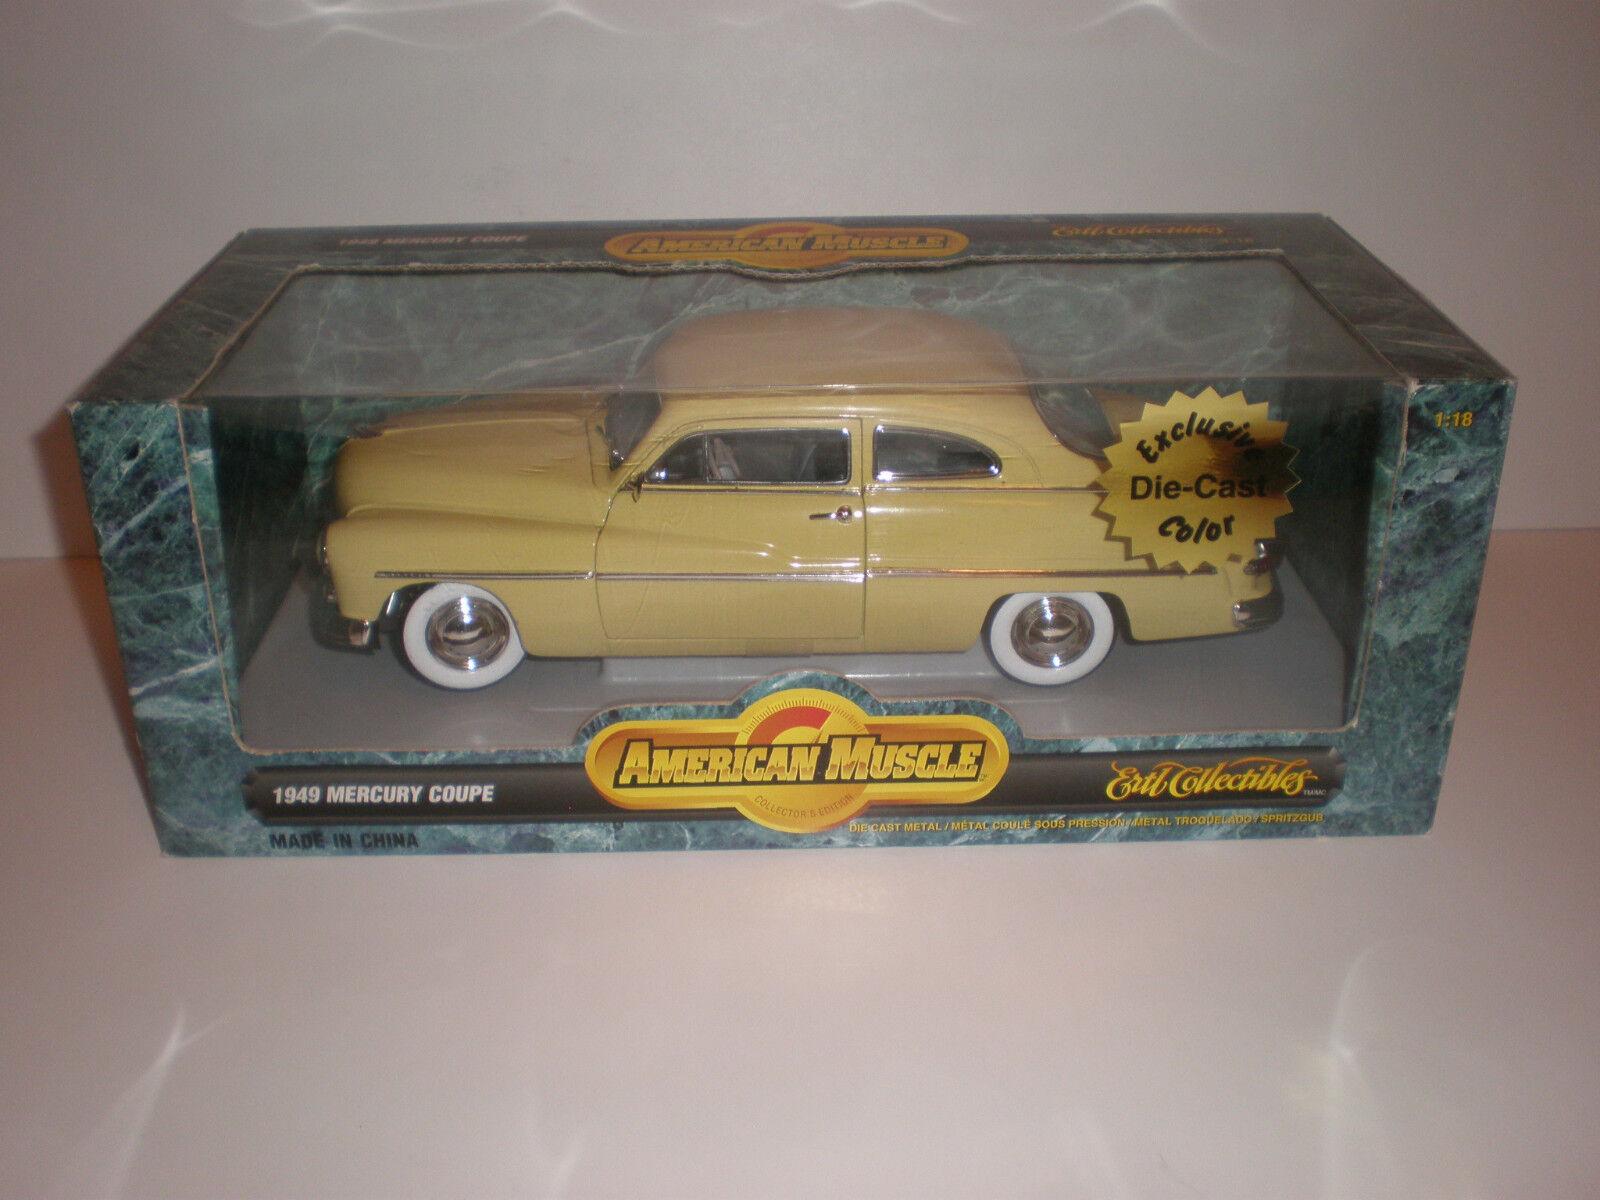 Centro comercial profesional integrado en línea. 1 1 1 18 1949 Mercury Coupe Ertl American Muscle  precio mas barato